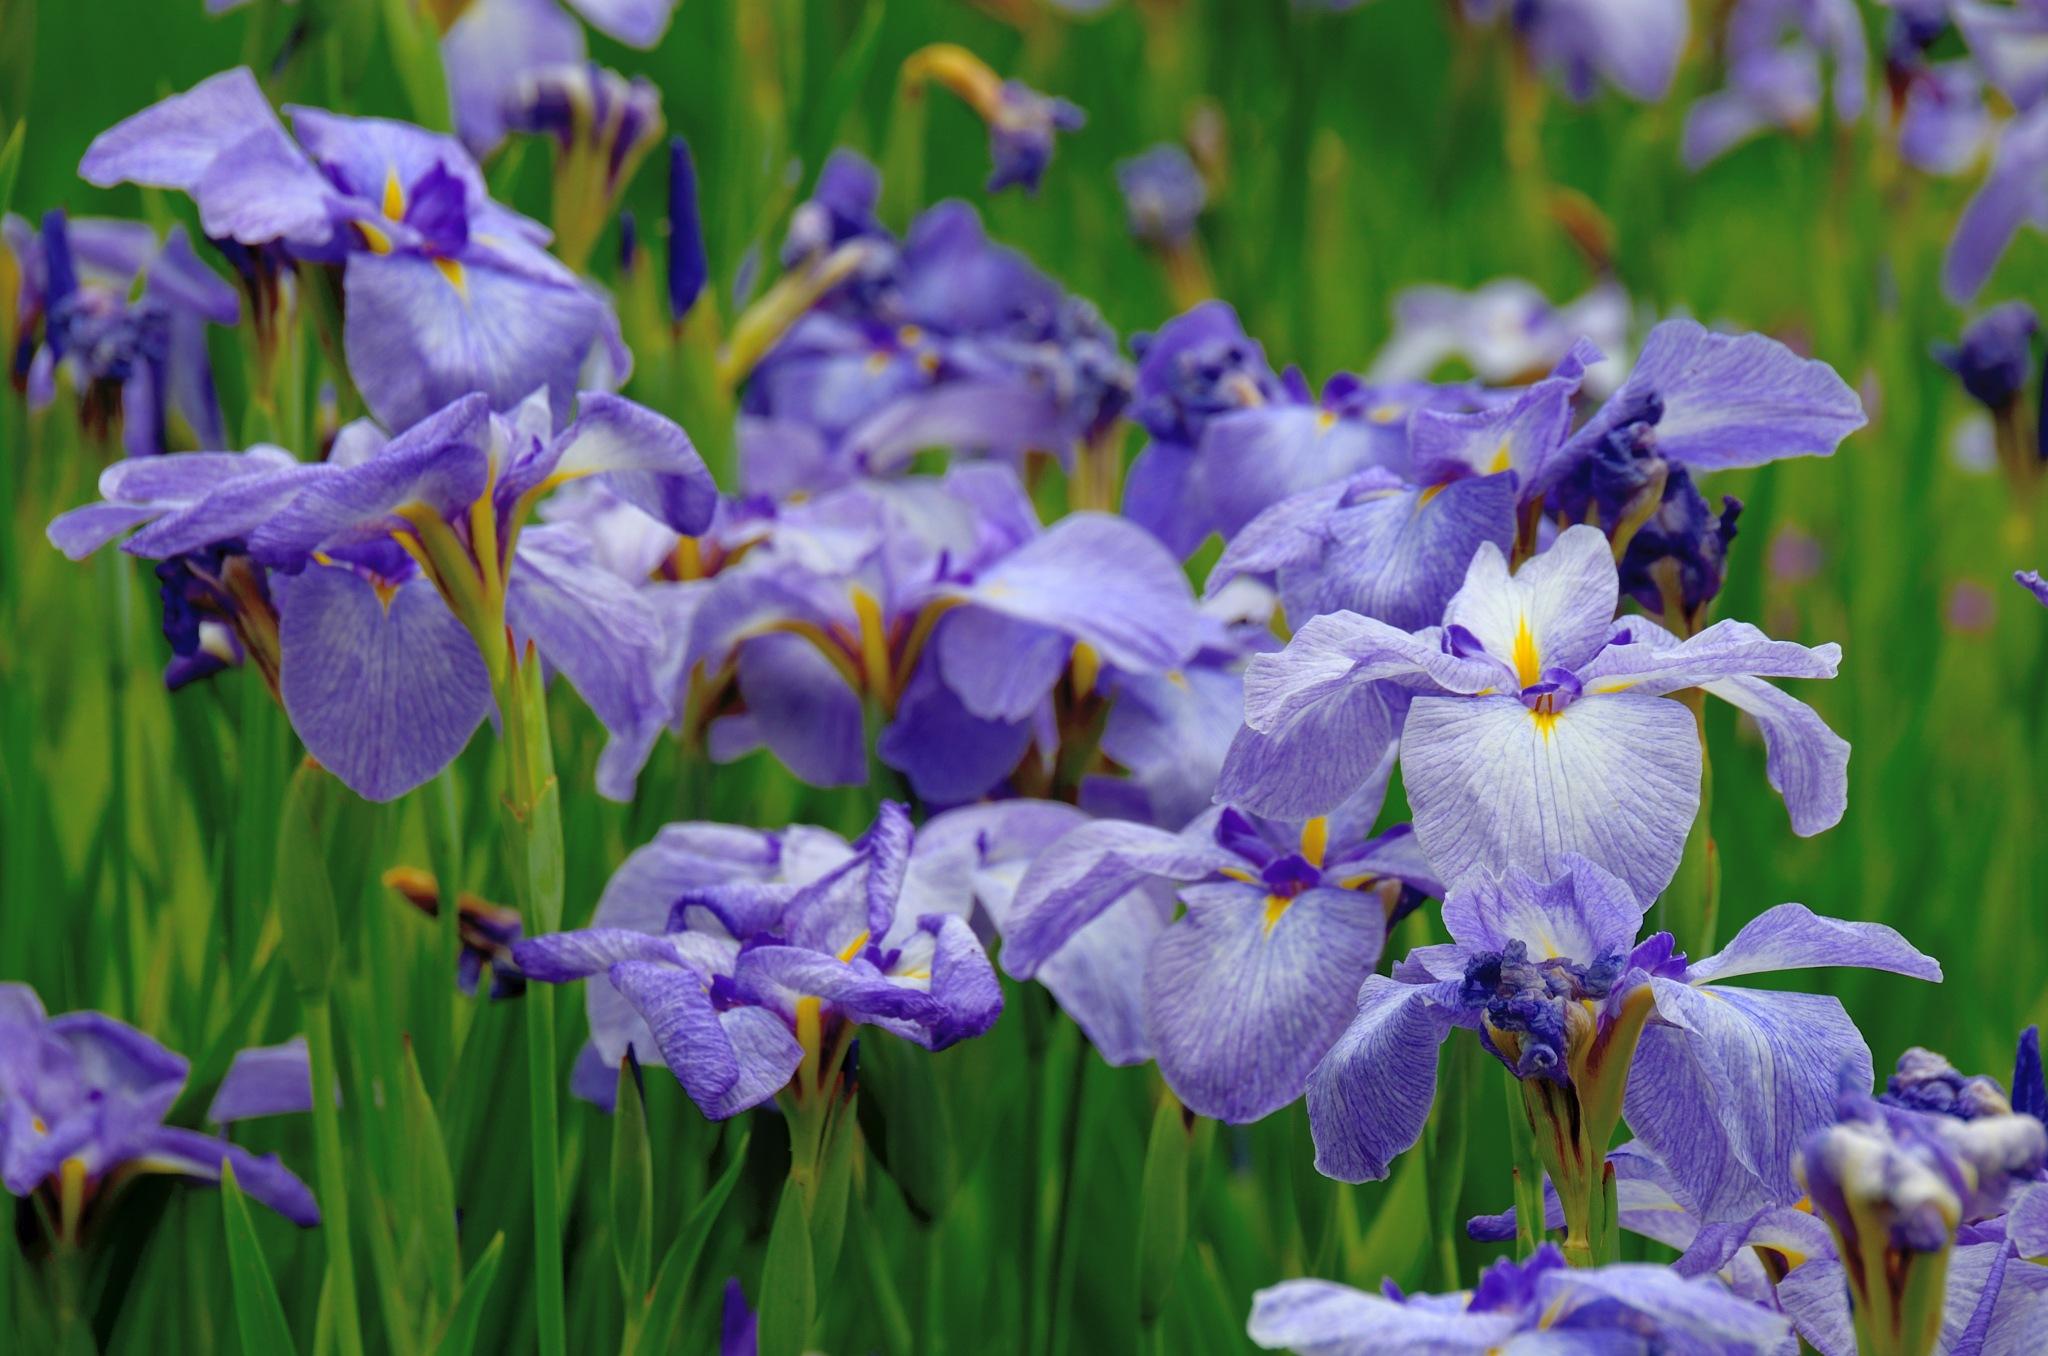 Iris take3 by Masahiro  Asano